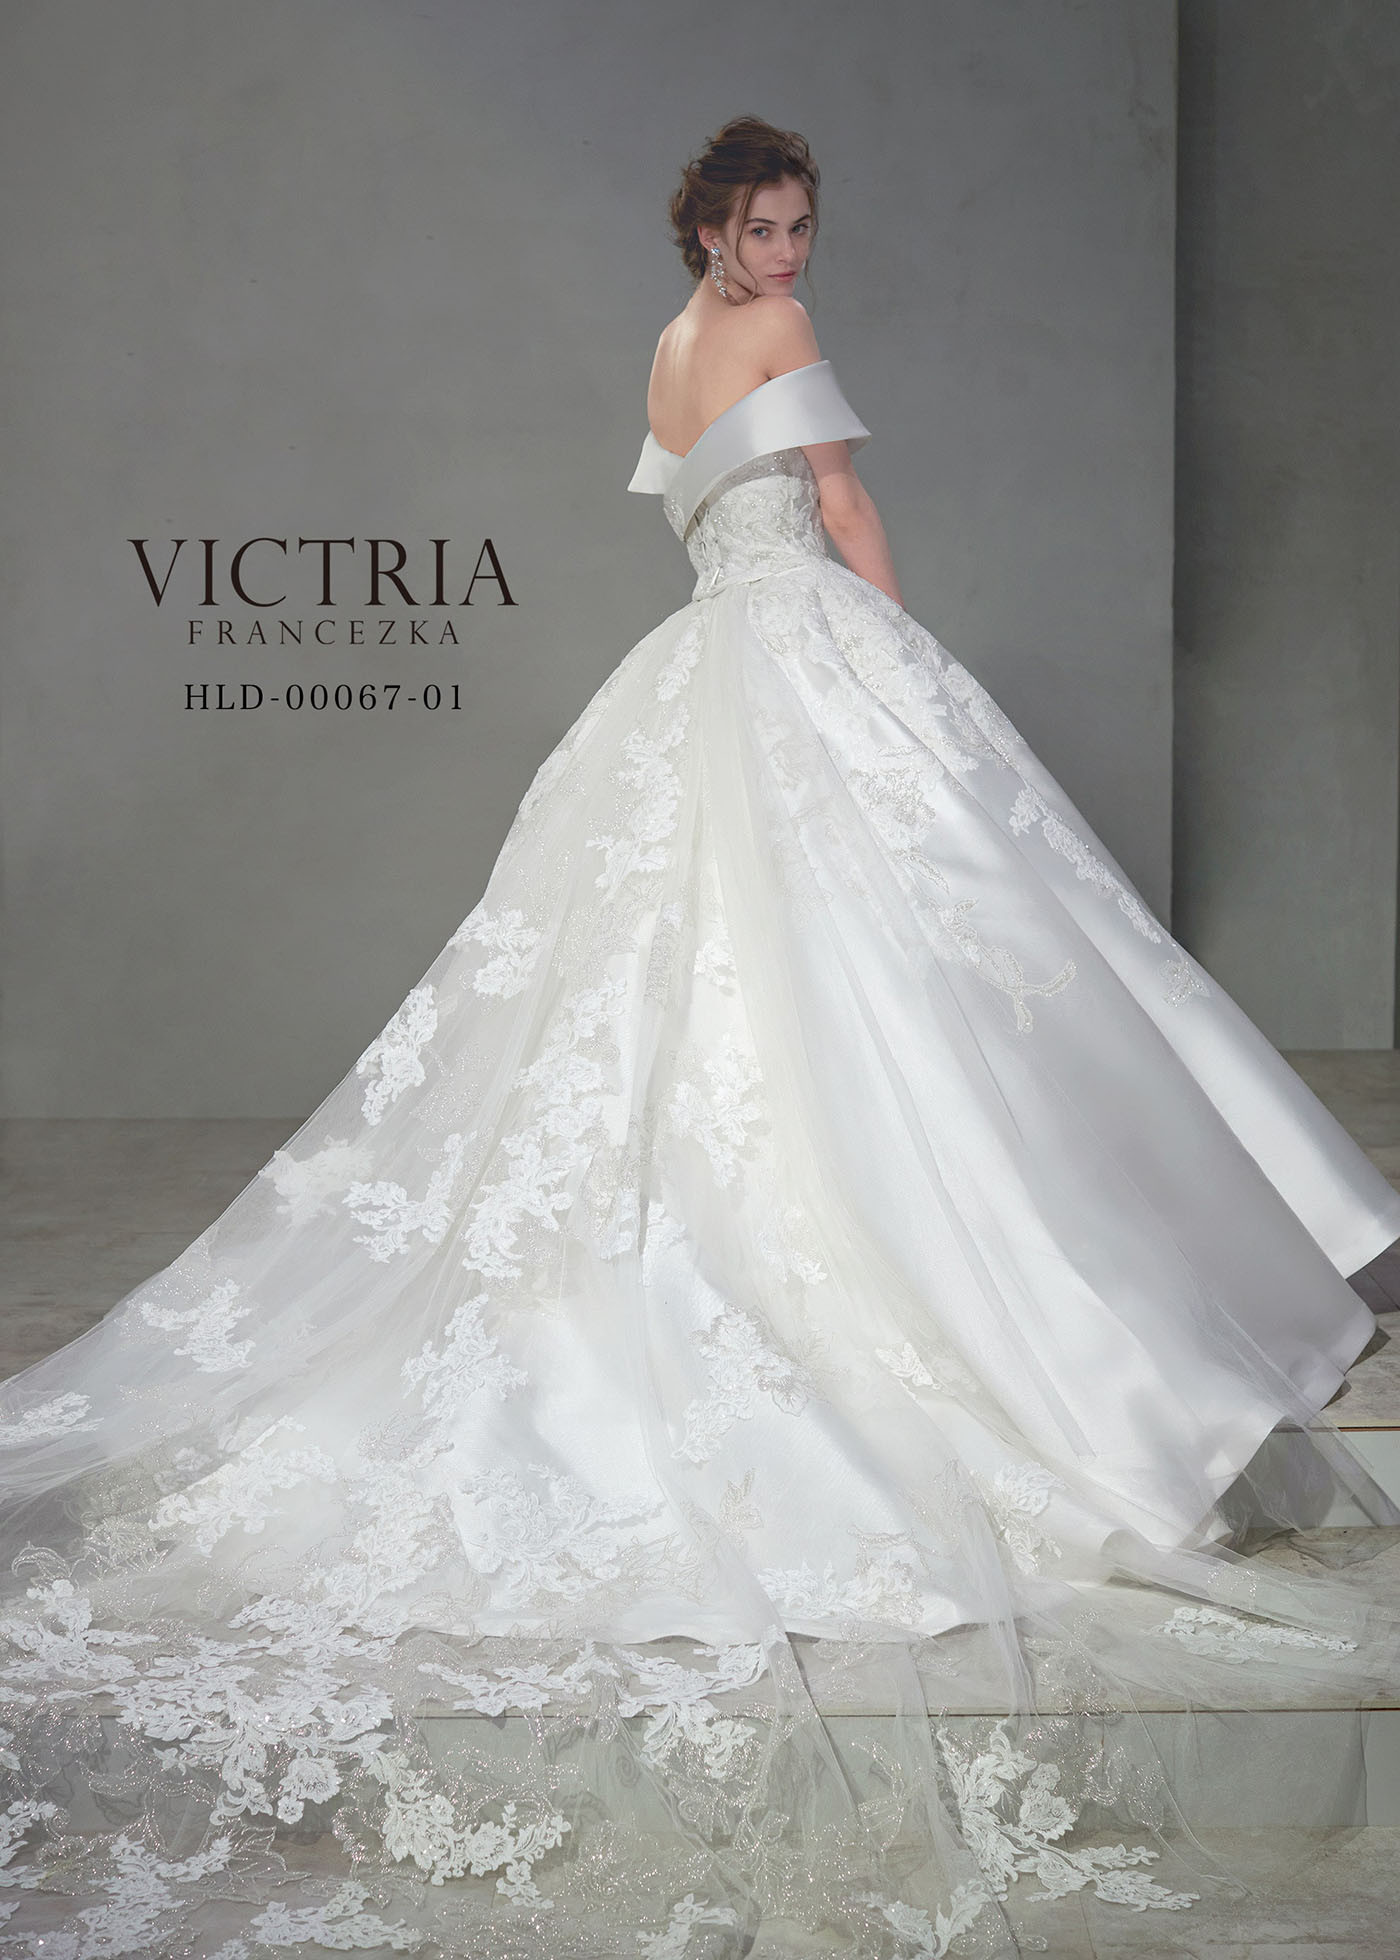 【VICTRIA PRINCEZKA】入荷予定ドレス HLD-00067-01